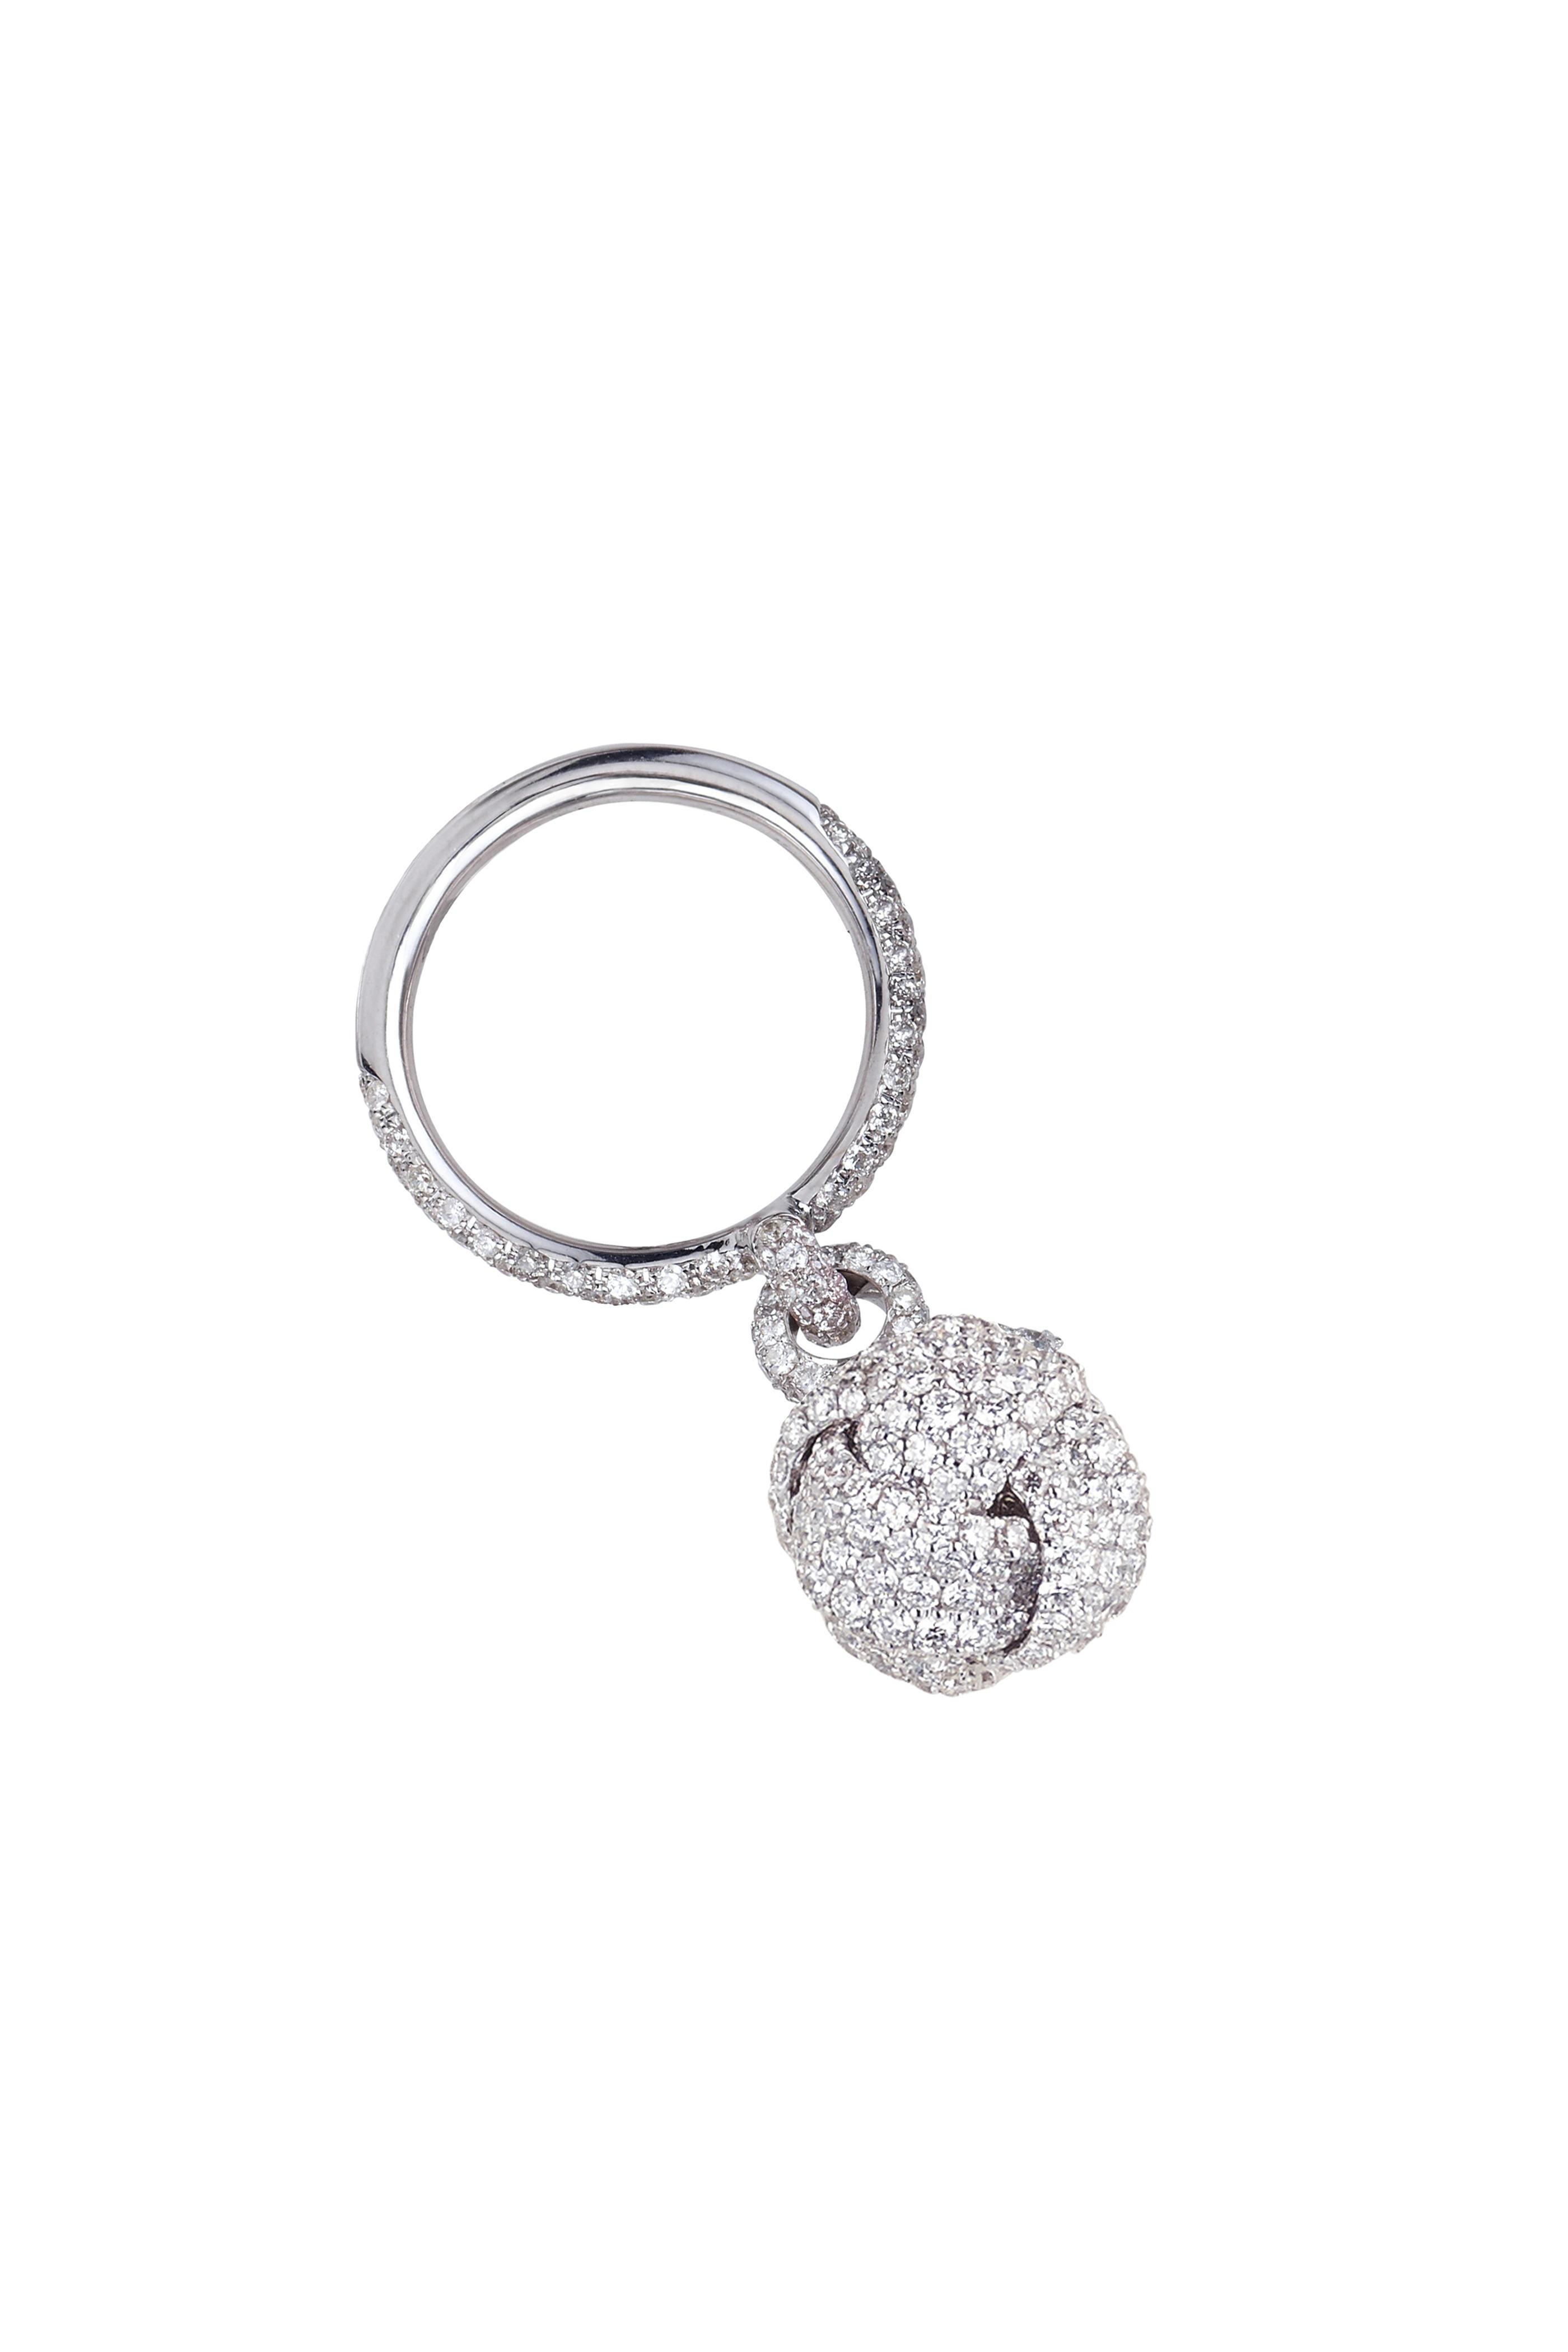 Mariani 18k White Gold Nodi Diamond Knot Ring Mitchell Stores